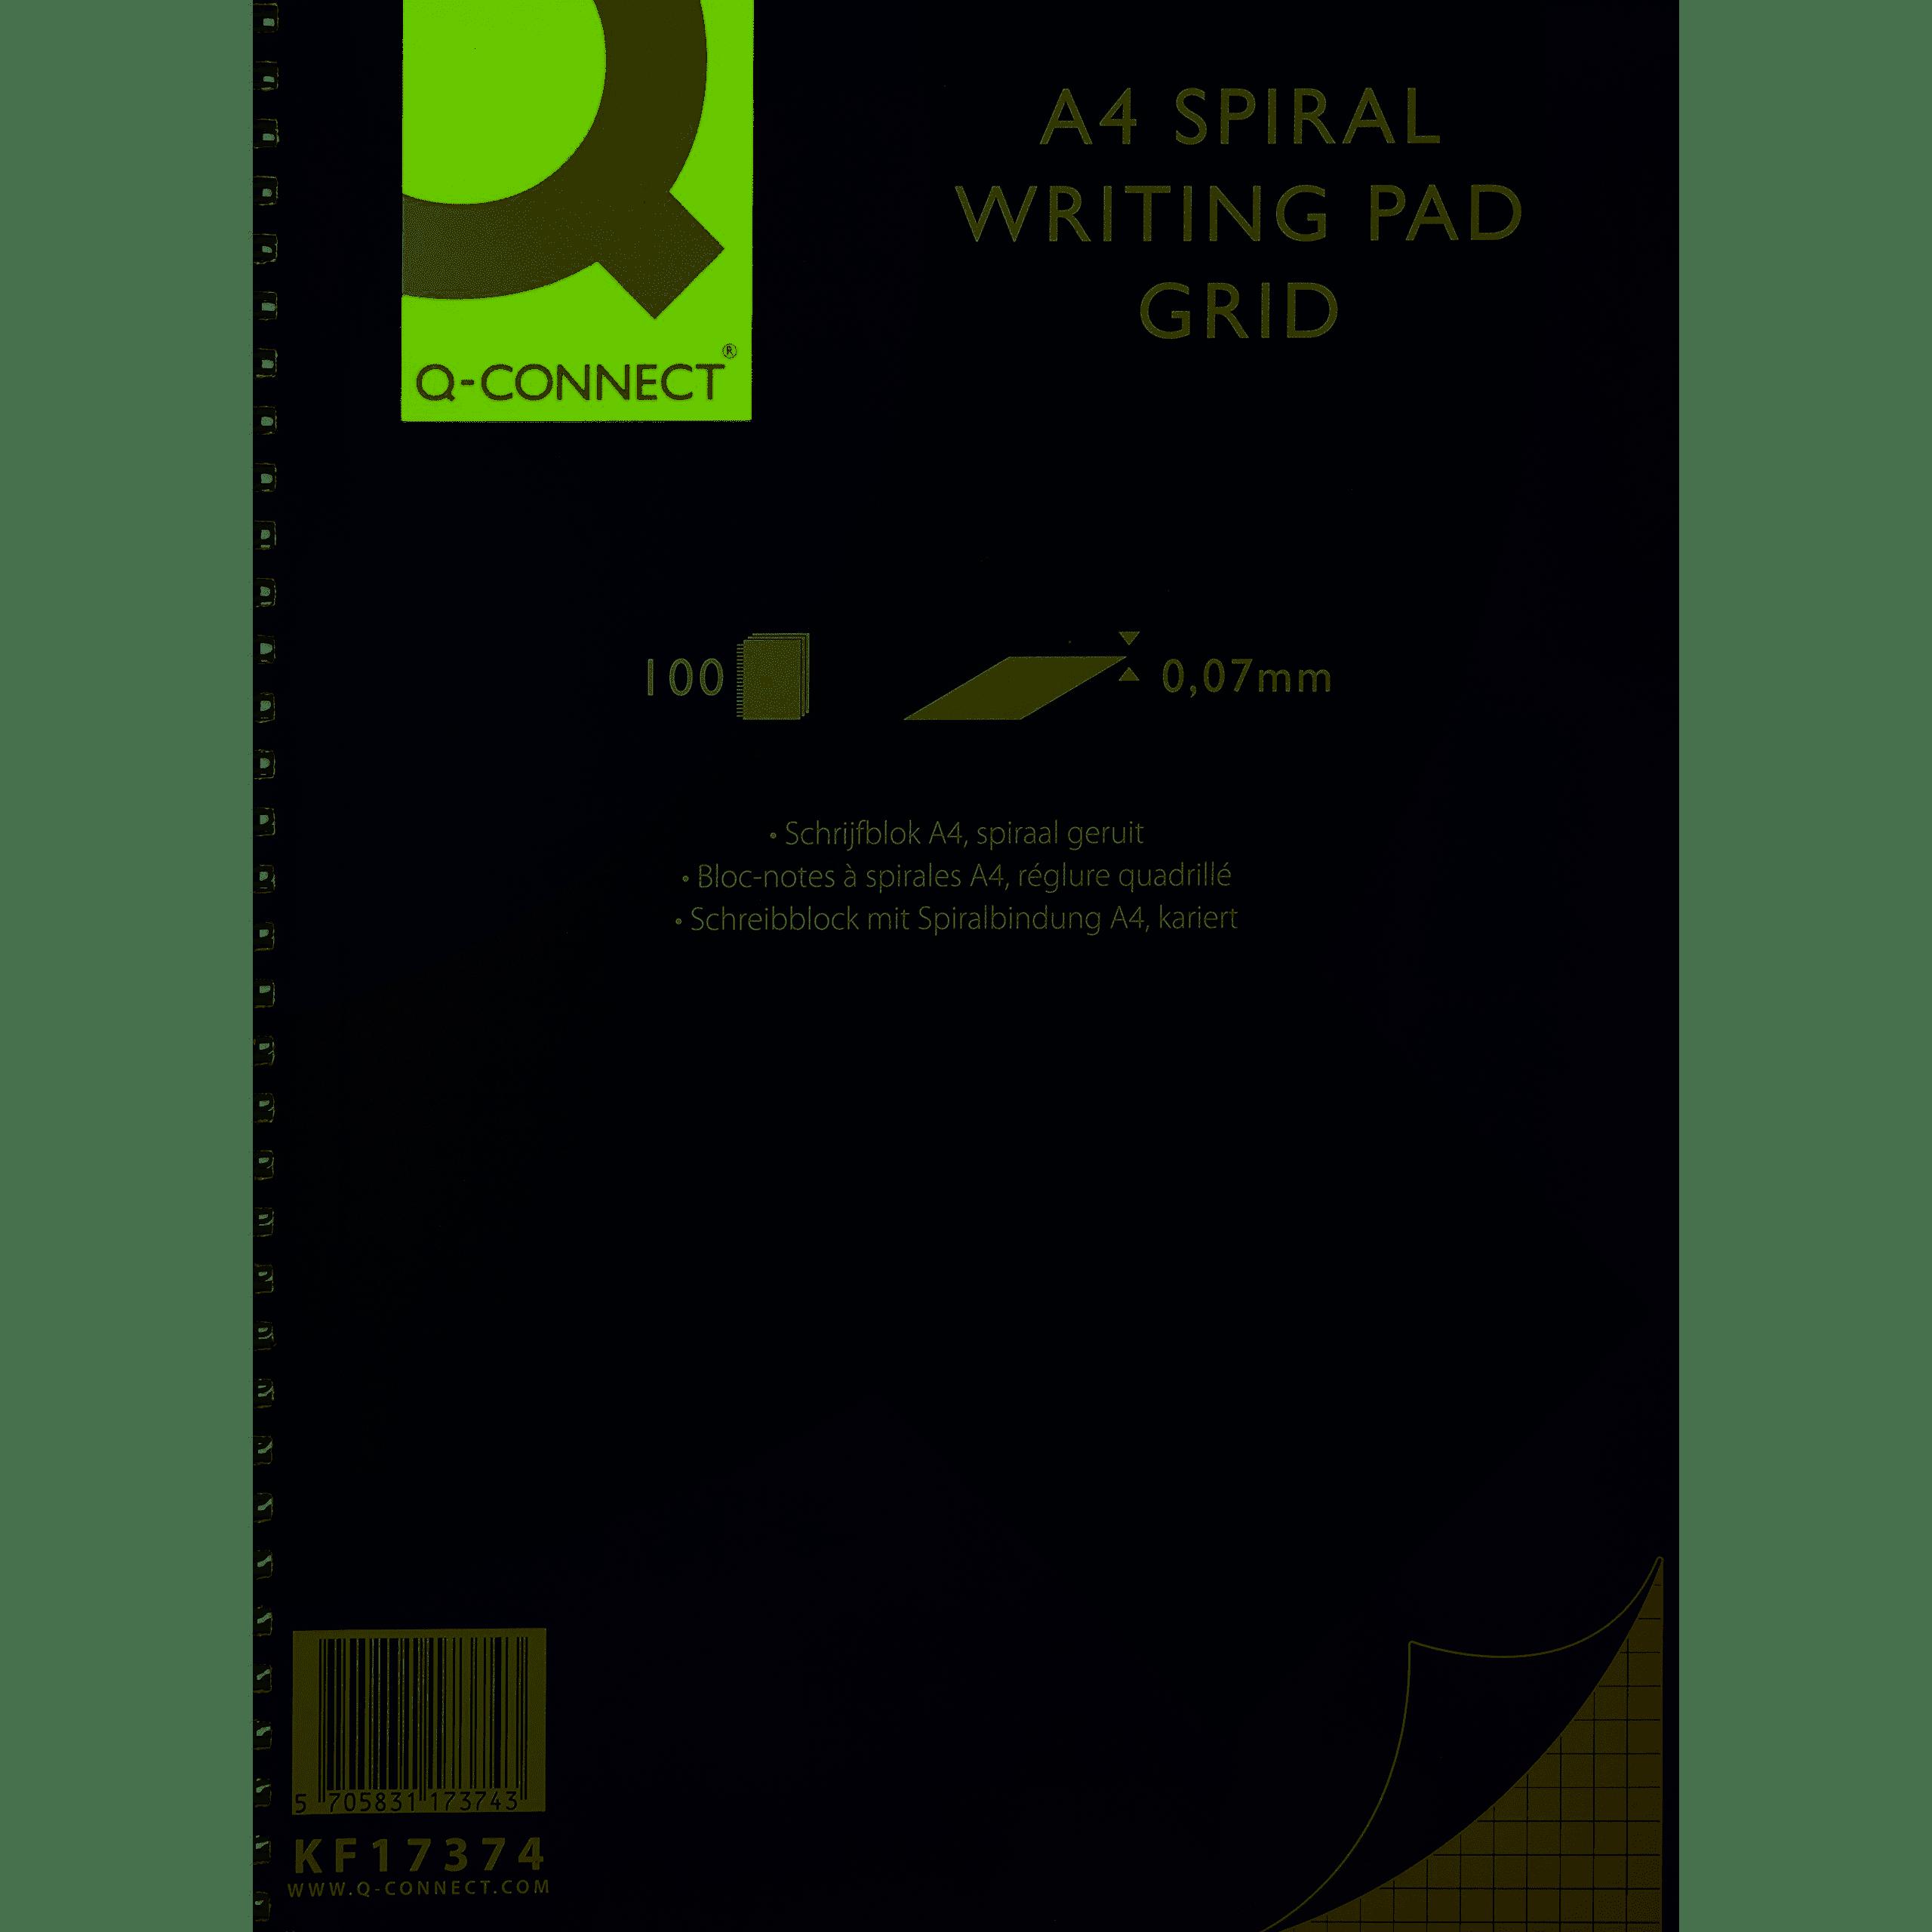 Q-Connect A4 Spiral Pad Quad 5mm 100 Sheets PK5